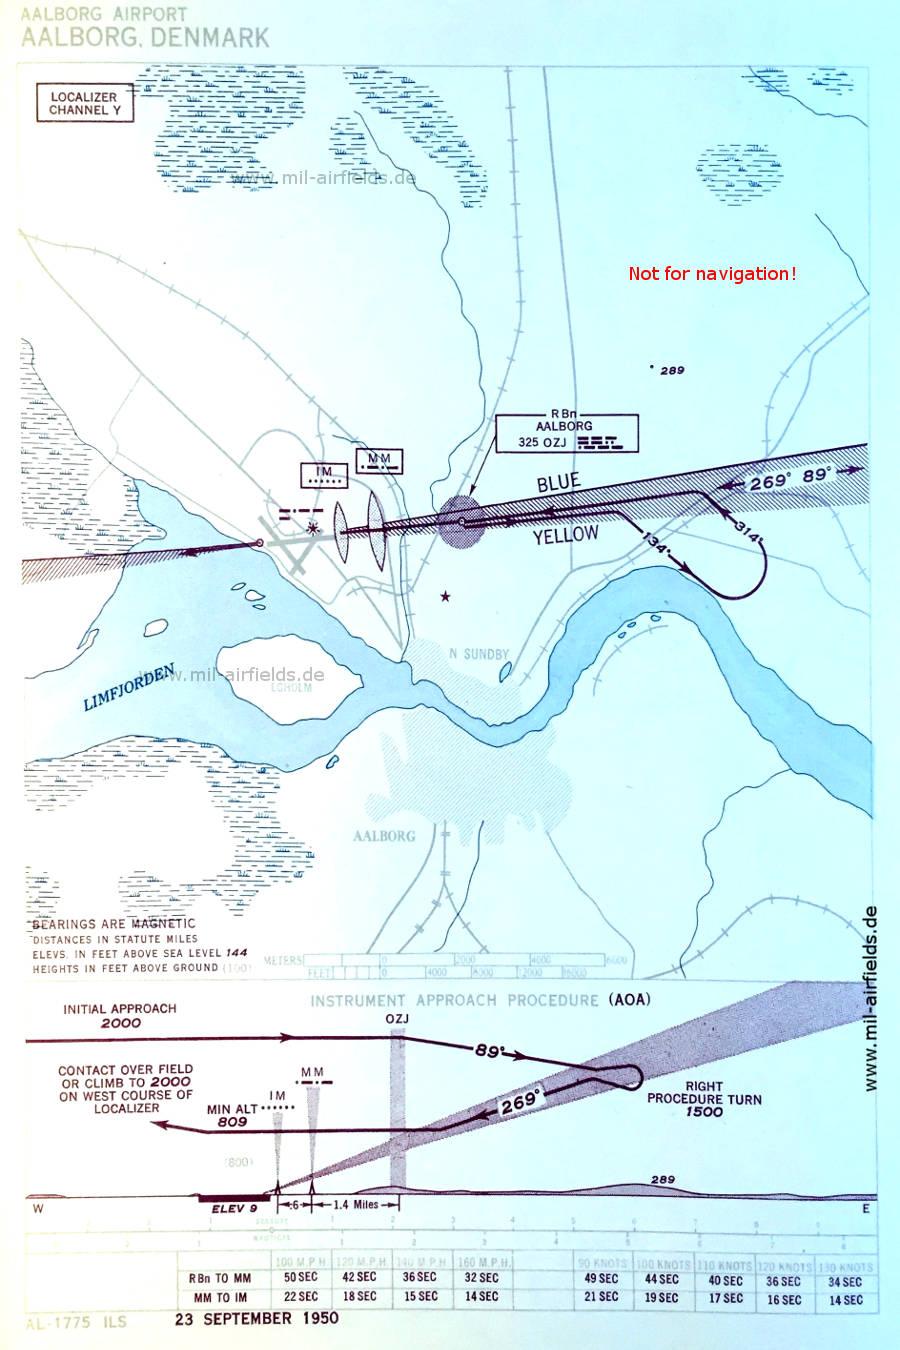 ILS approach chart runway 27 Aalborg Airport / Lufthavn, Denmark 1950